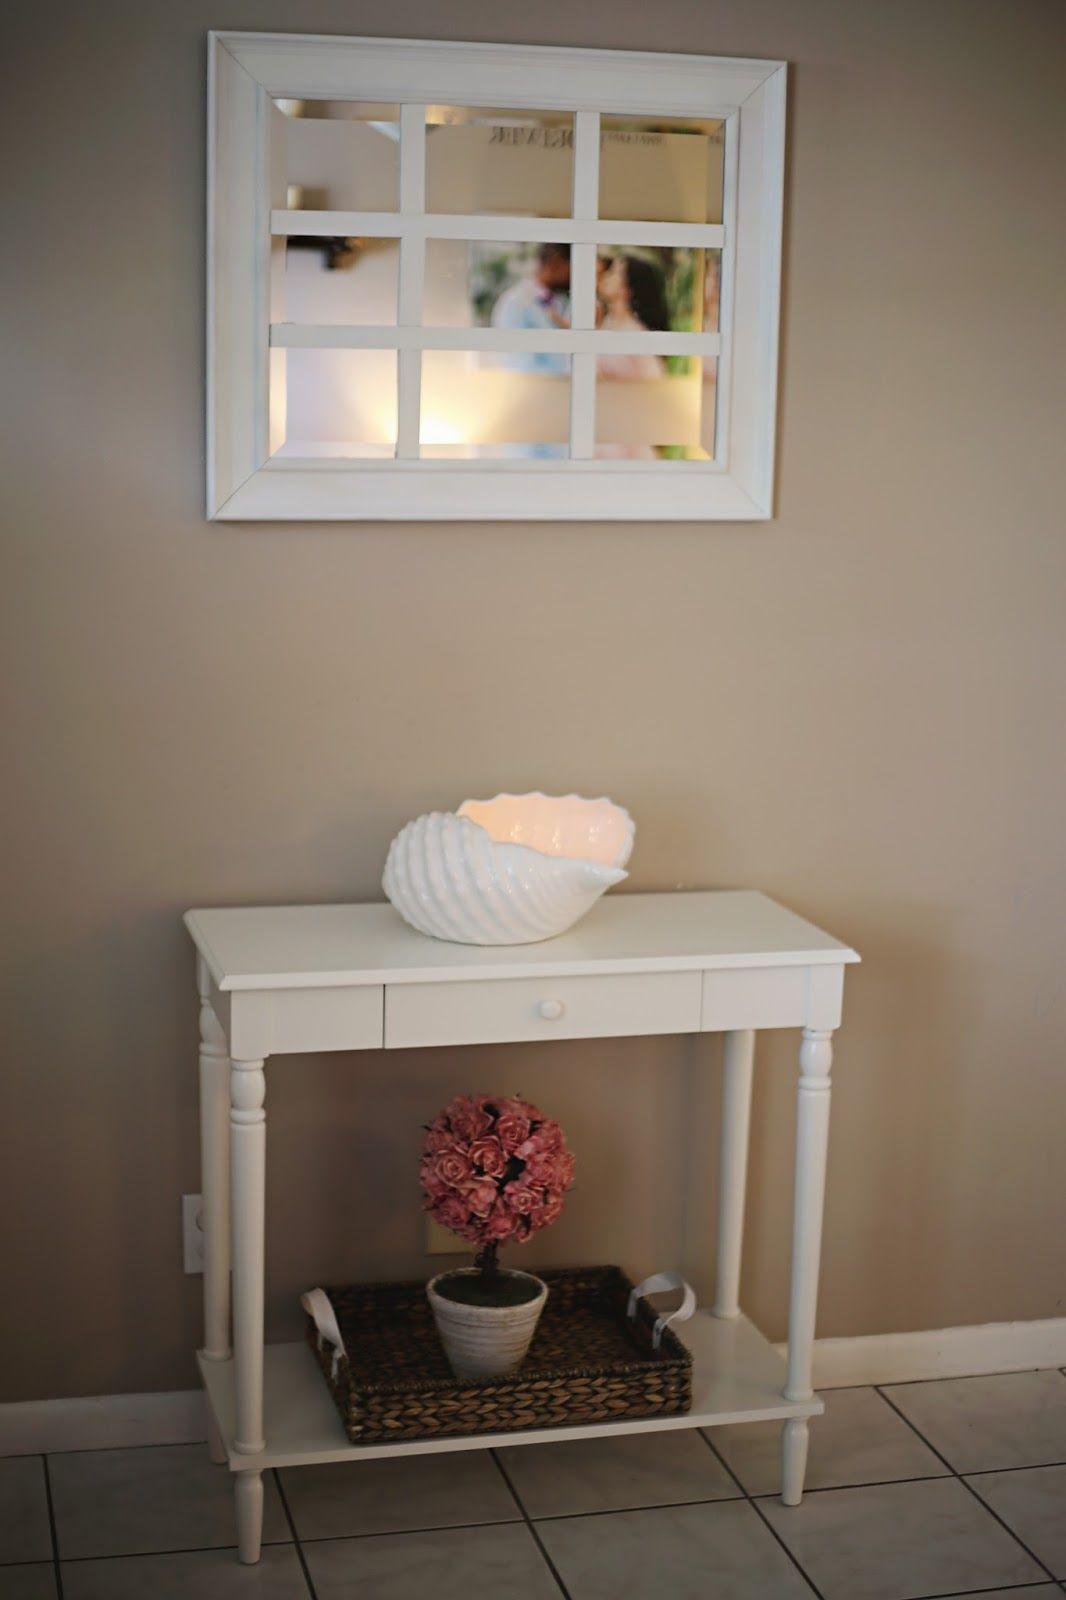 Diy window pane multipanel mirror pottery barn dupe hack